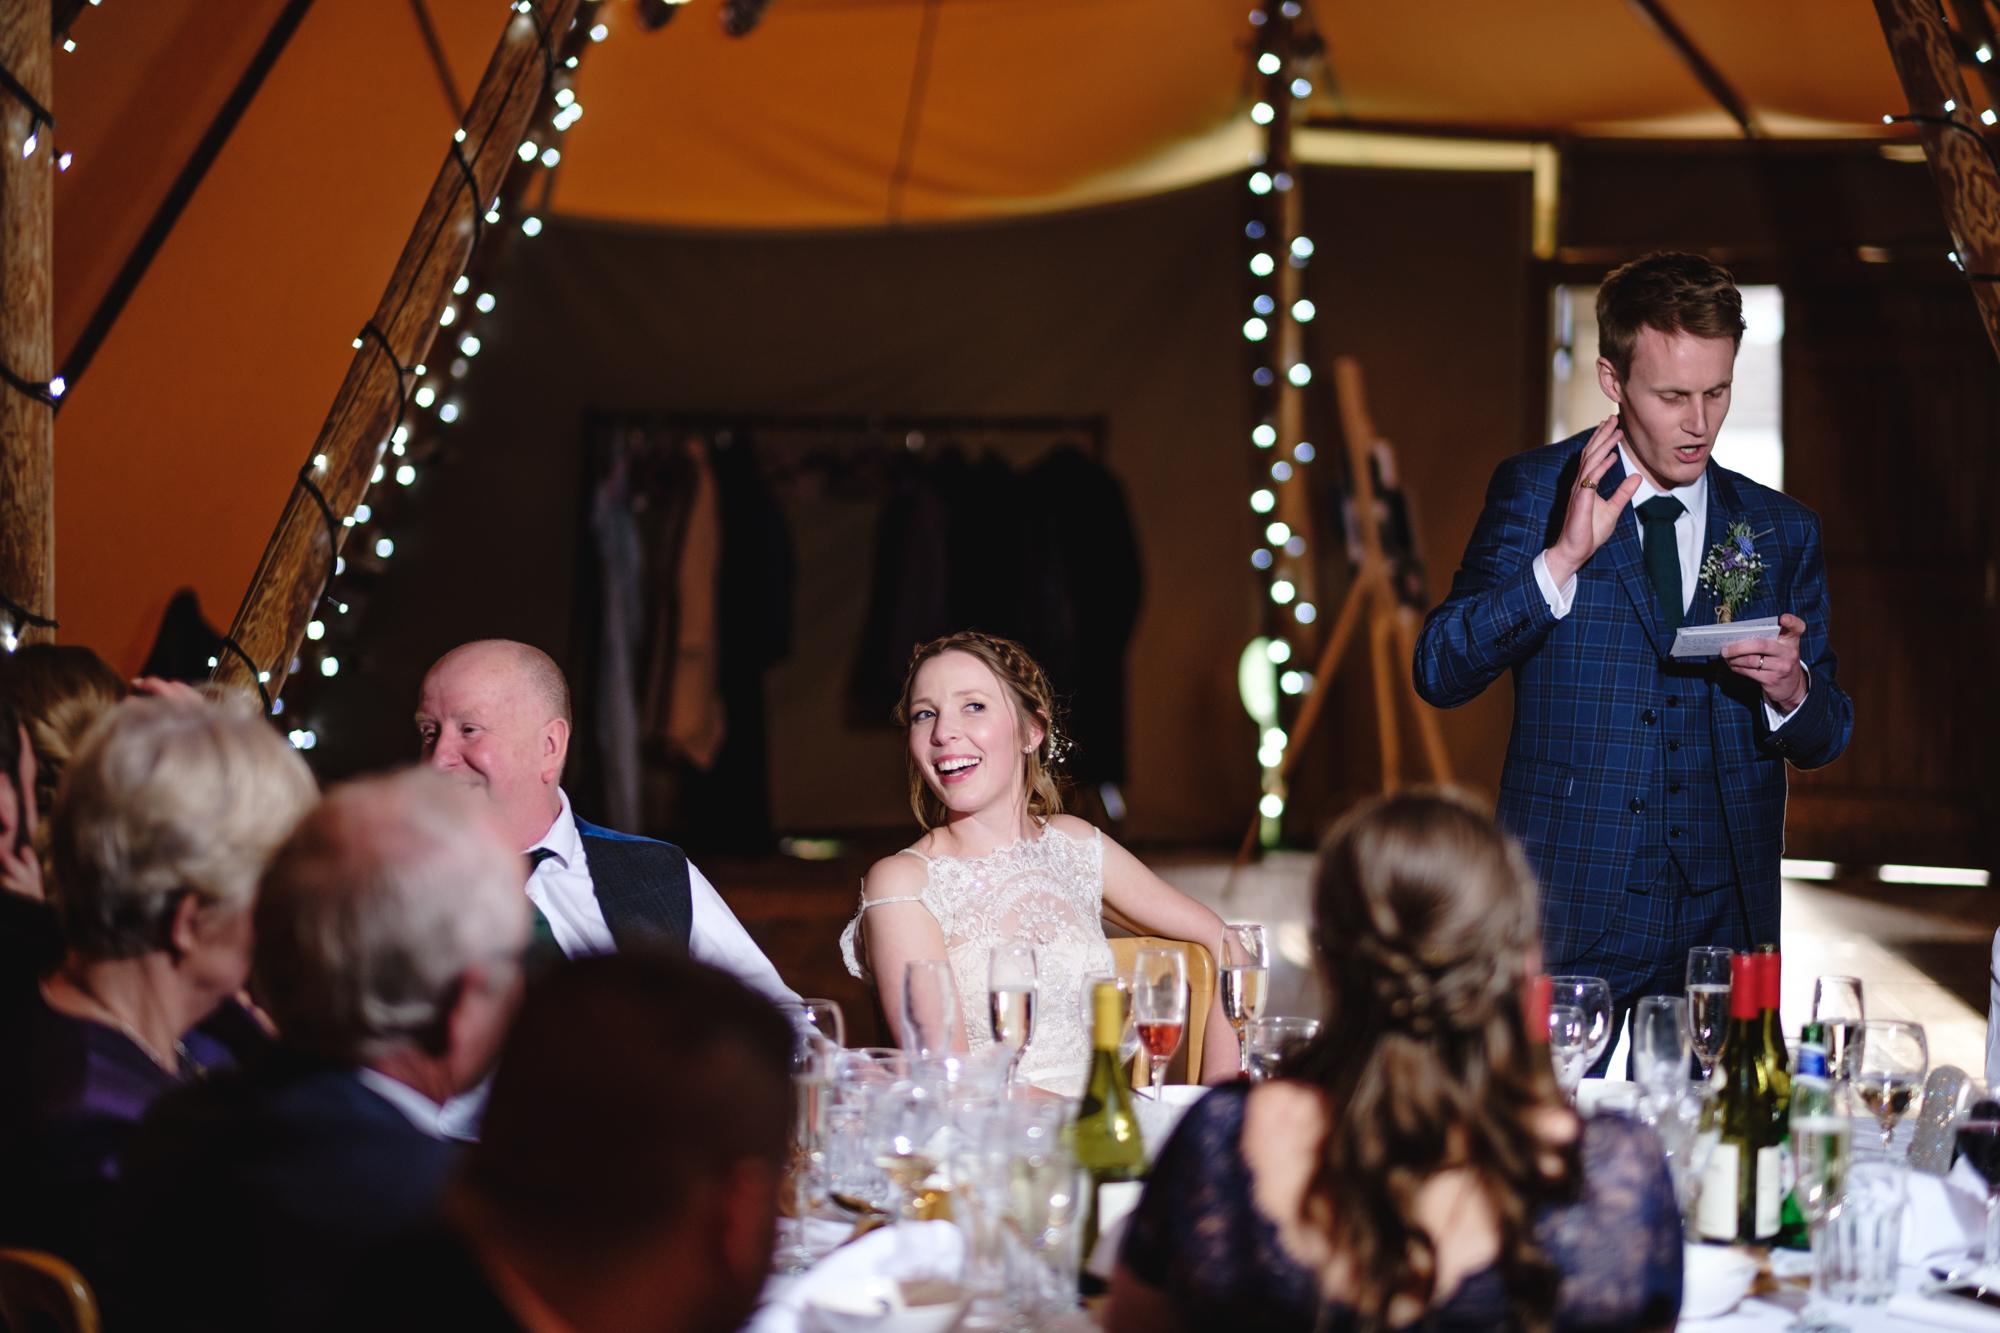 Katie and Dode weddings (166 of 207).jpg